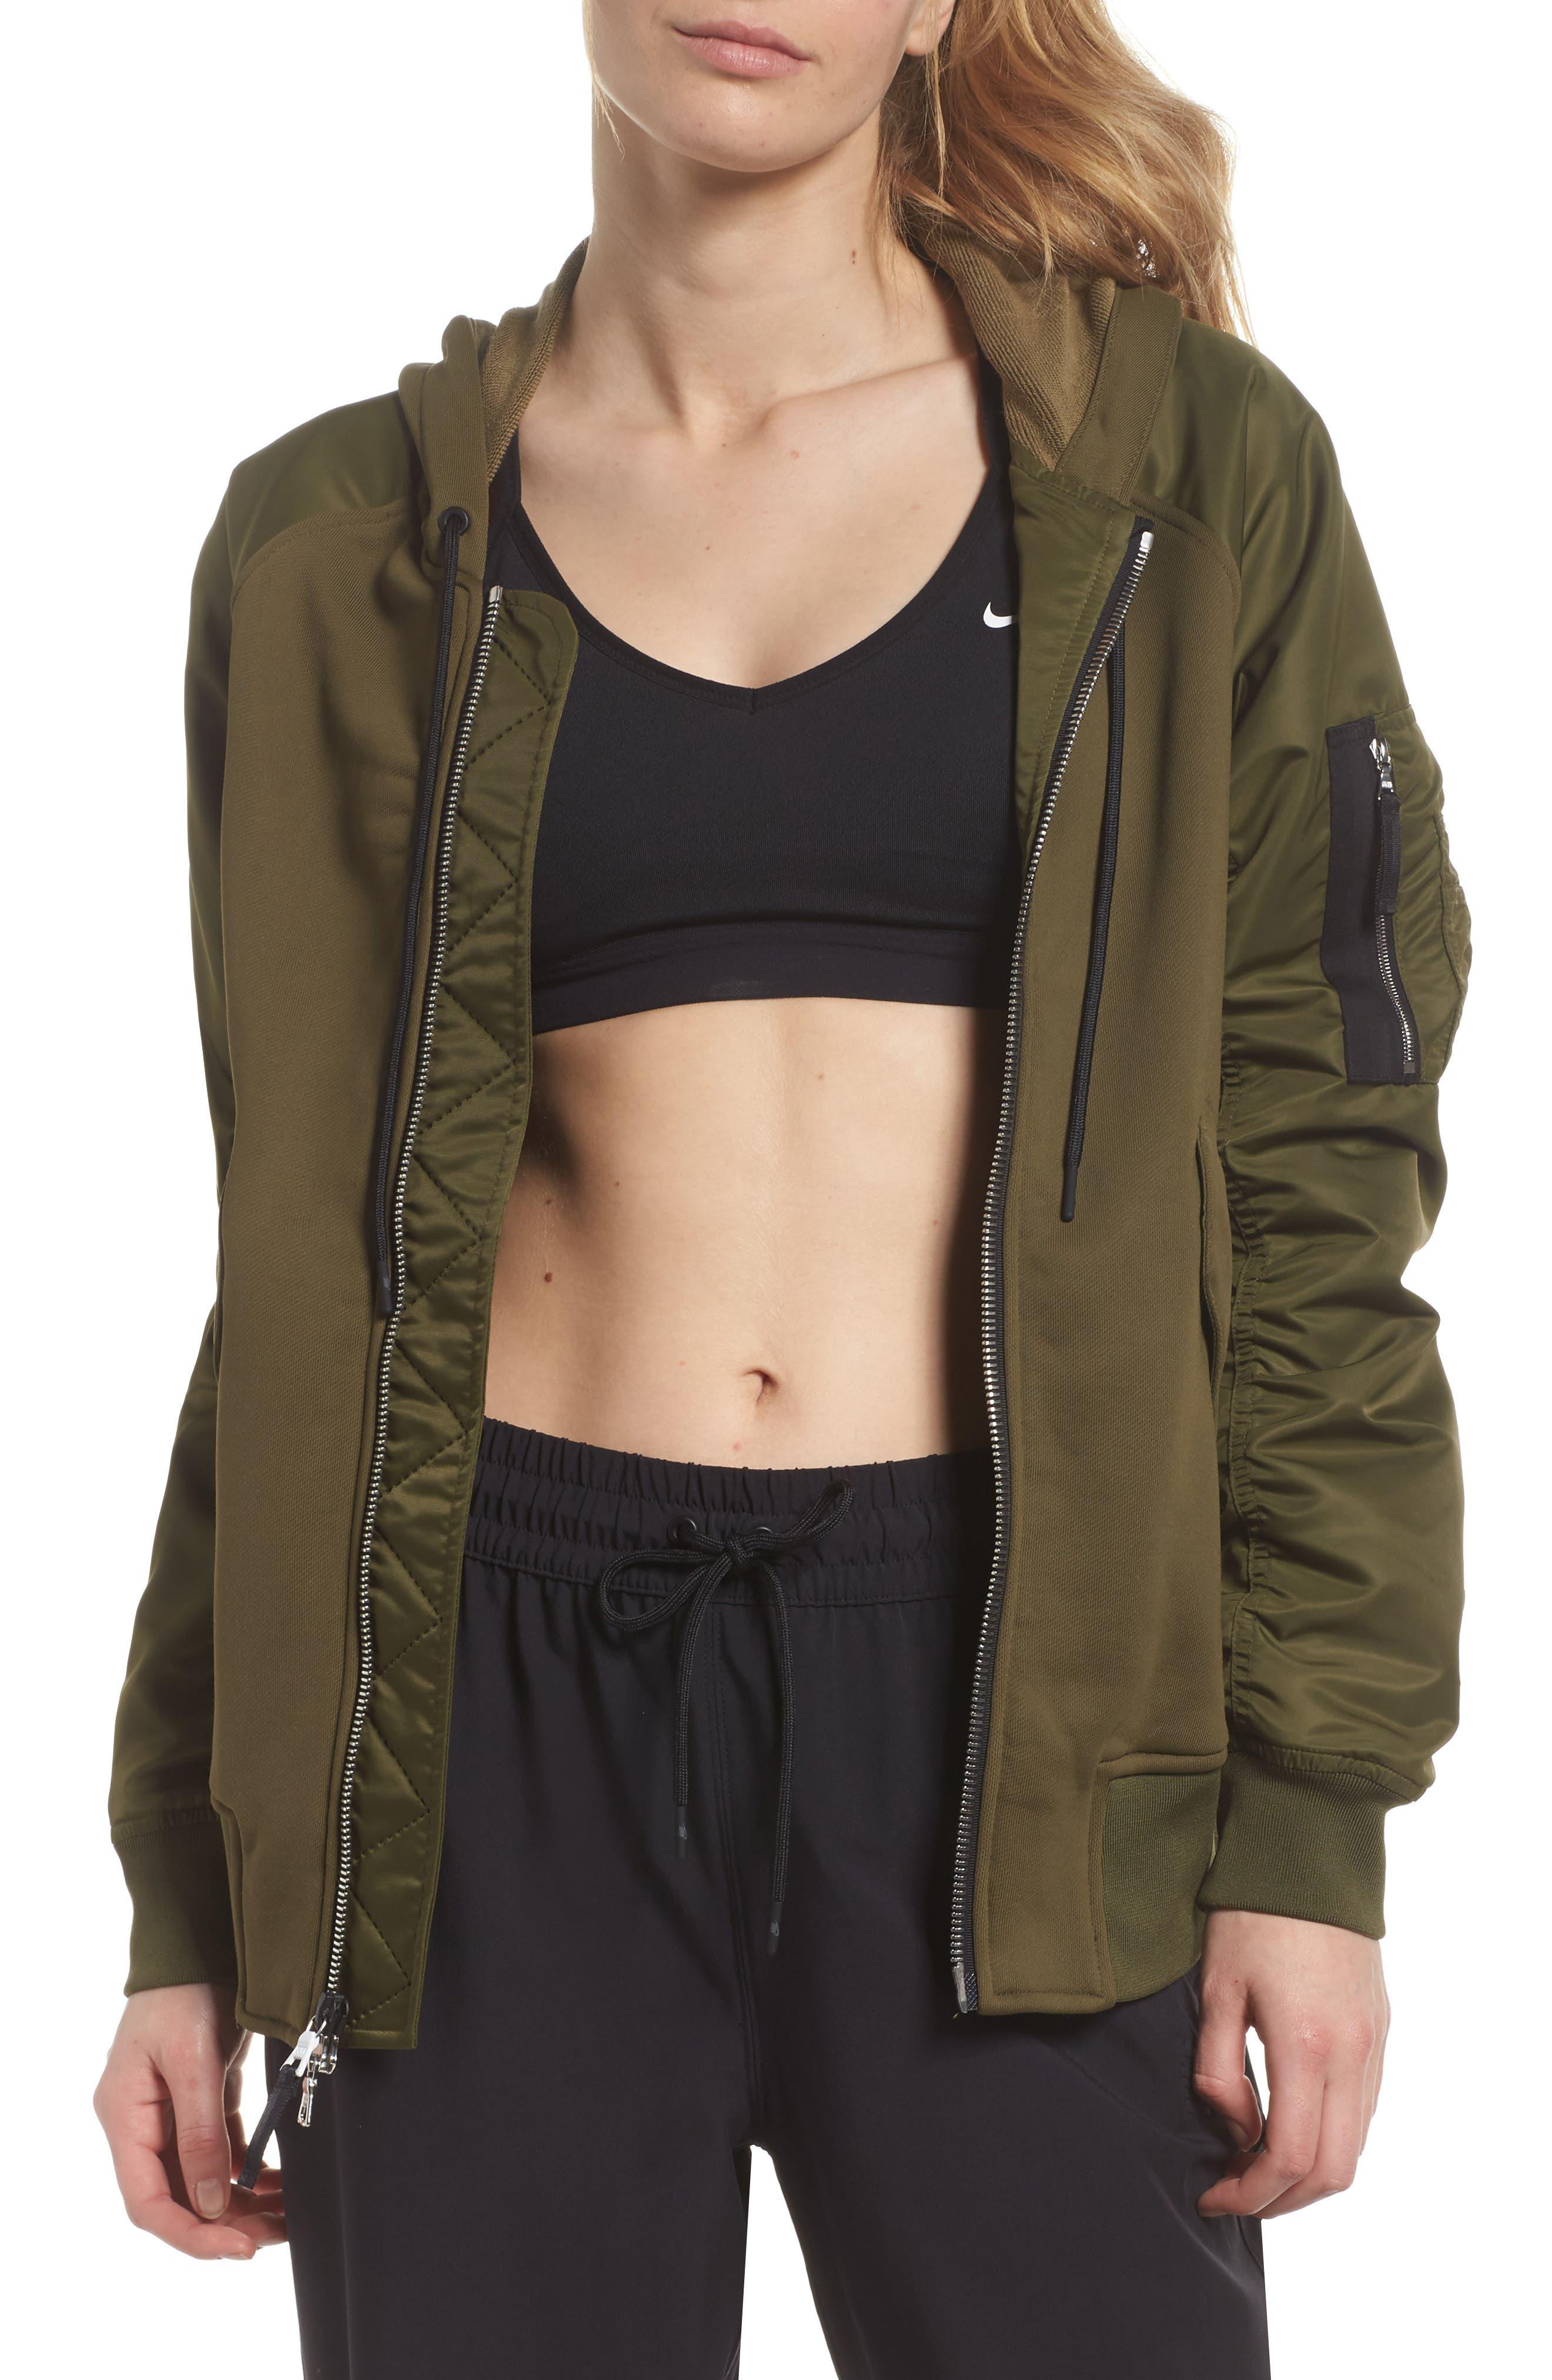 NikeLab Women's Mixed Media Bomber Jacket,                             Main thumbnail 1, color,                             Olive Canvas/ Black